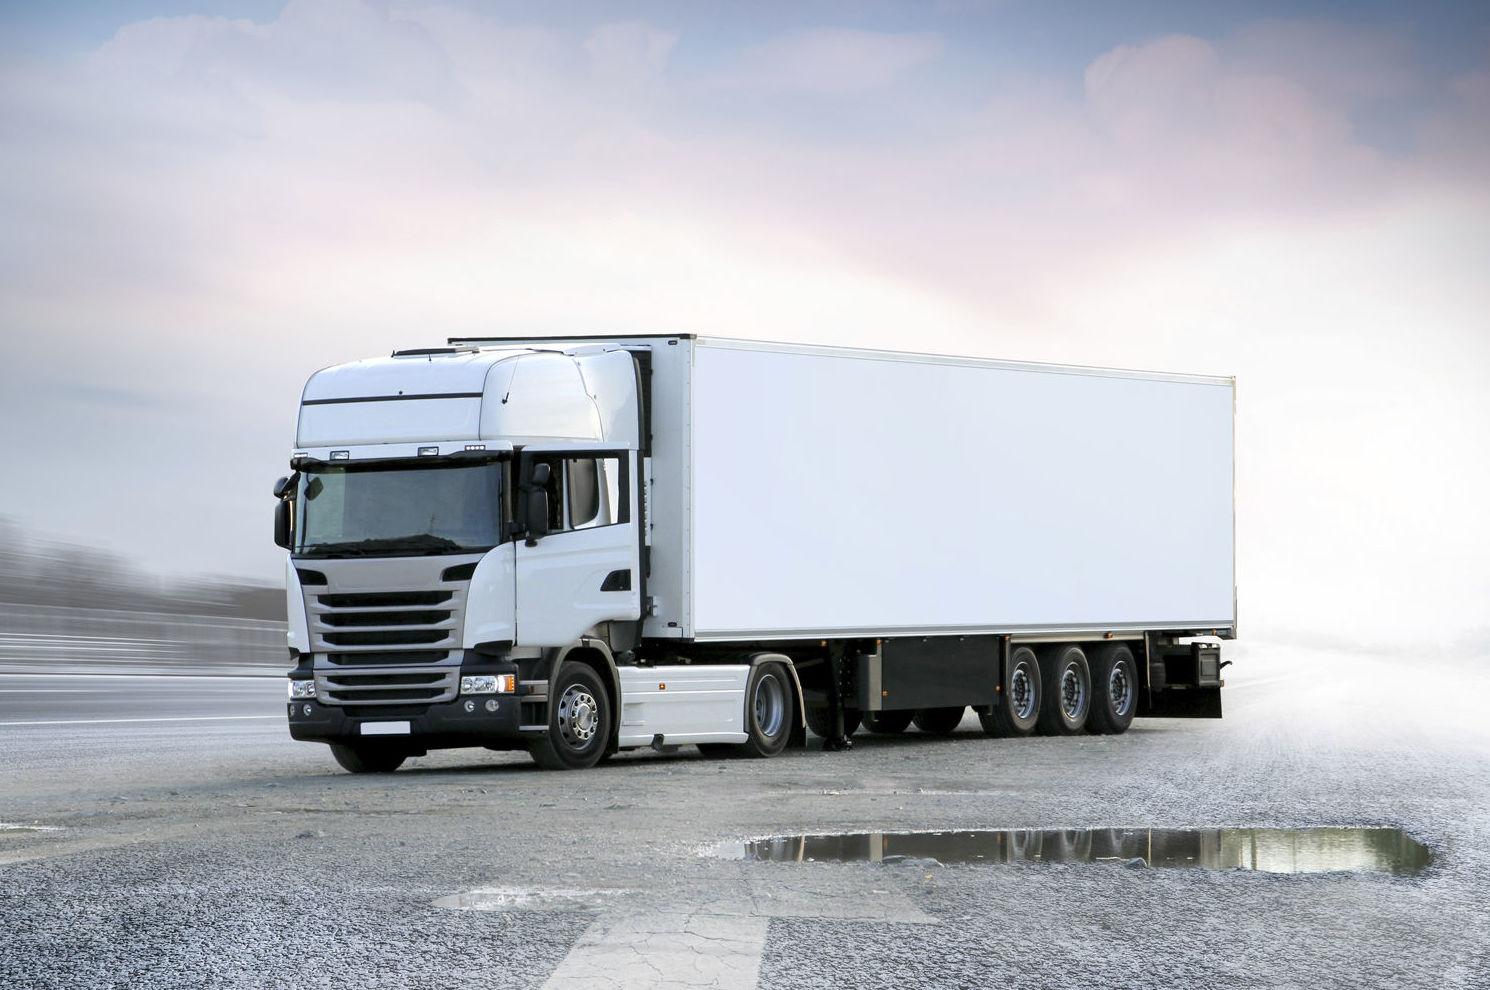 Empresa de transporte frigorífico internacional